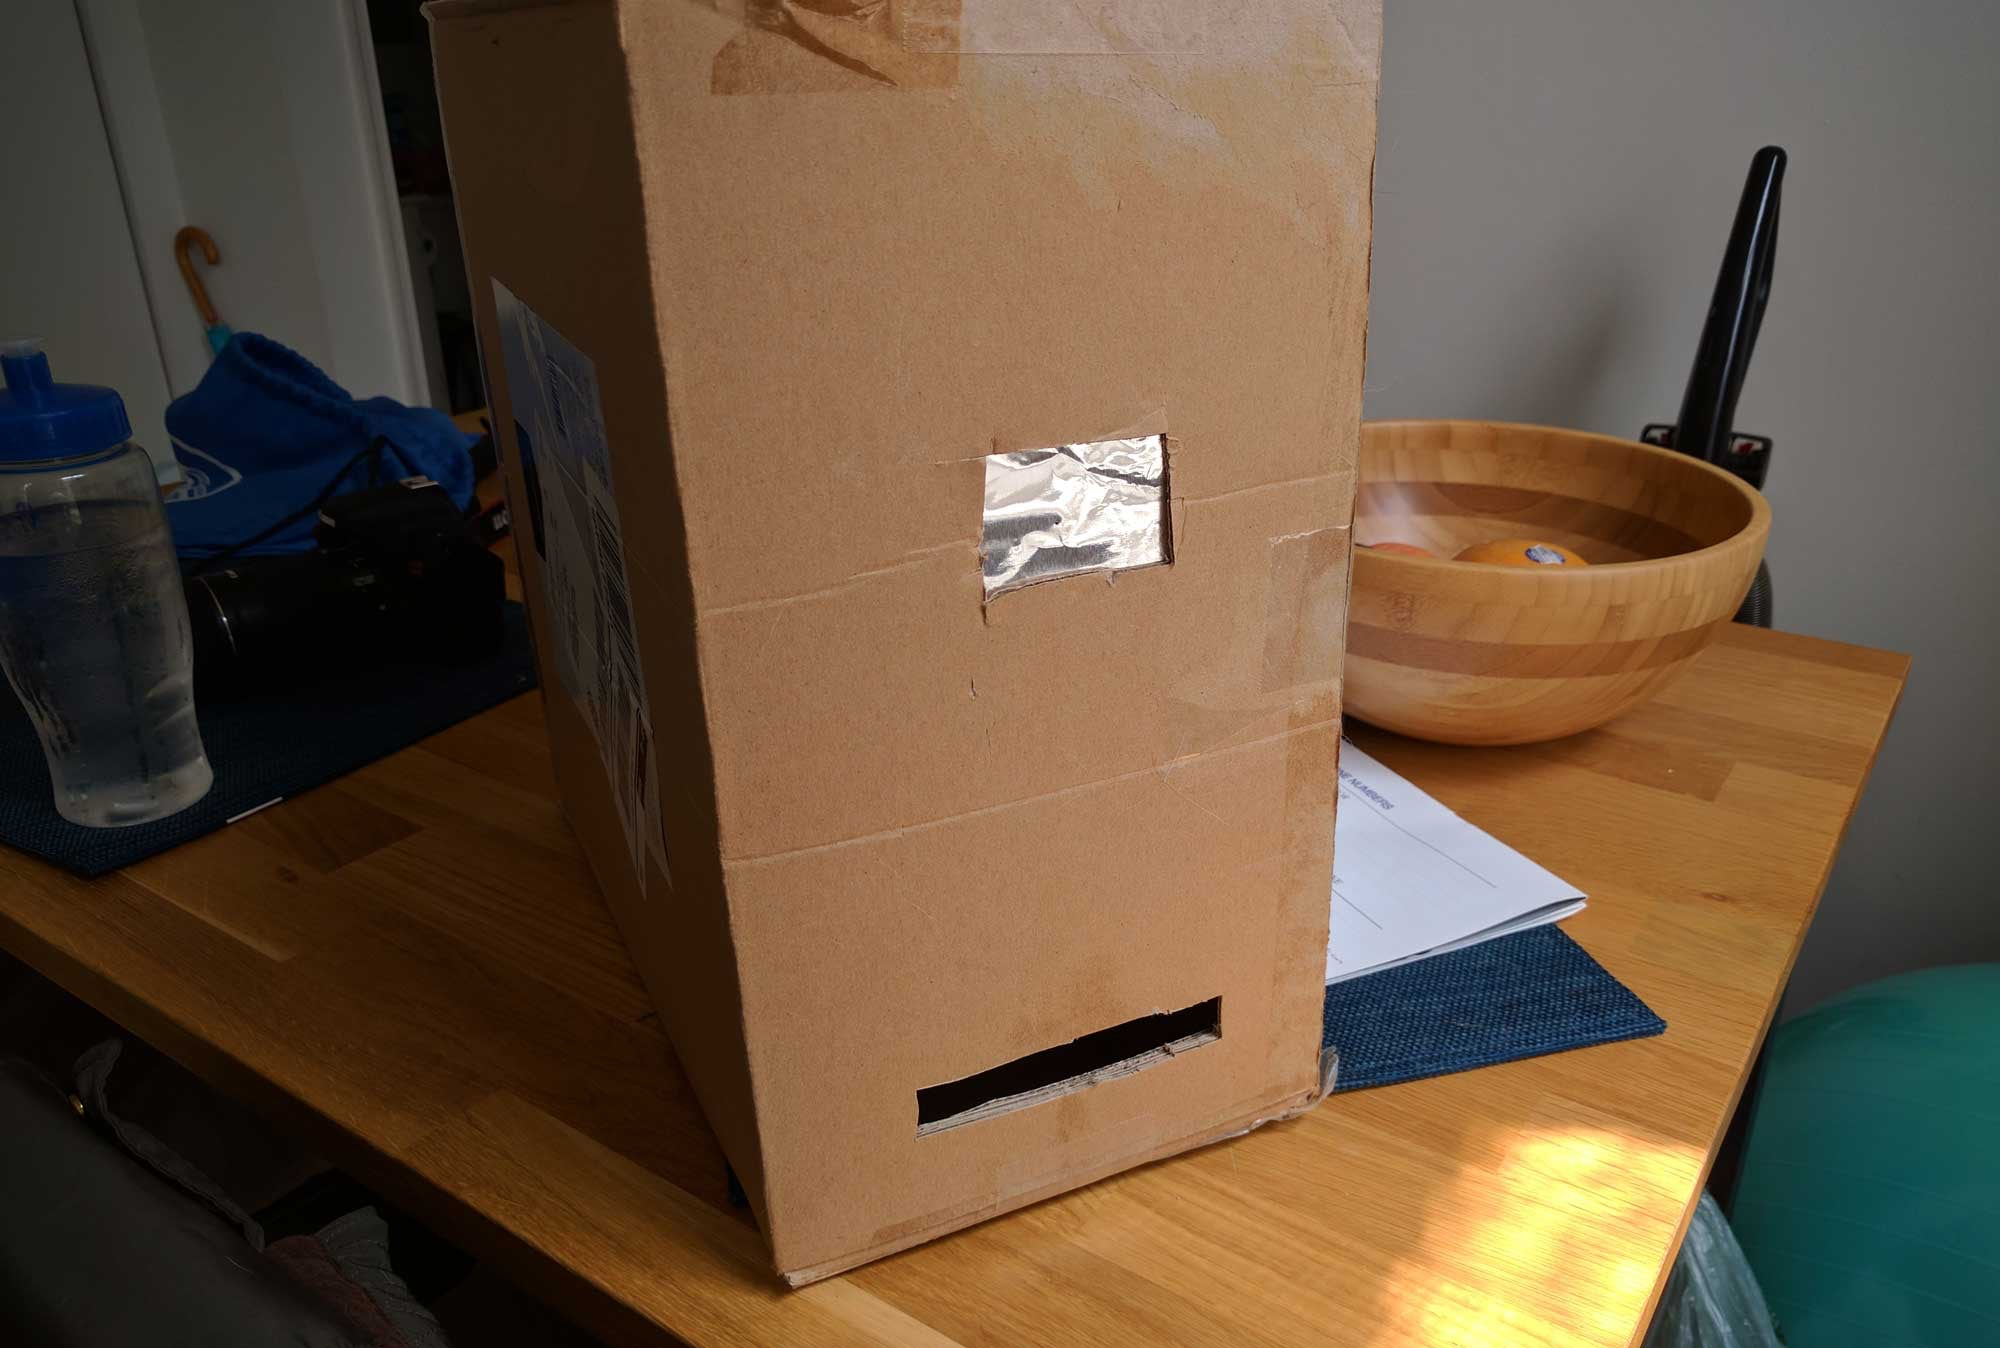 Nick Clyde's pinhole camera box